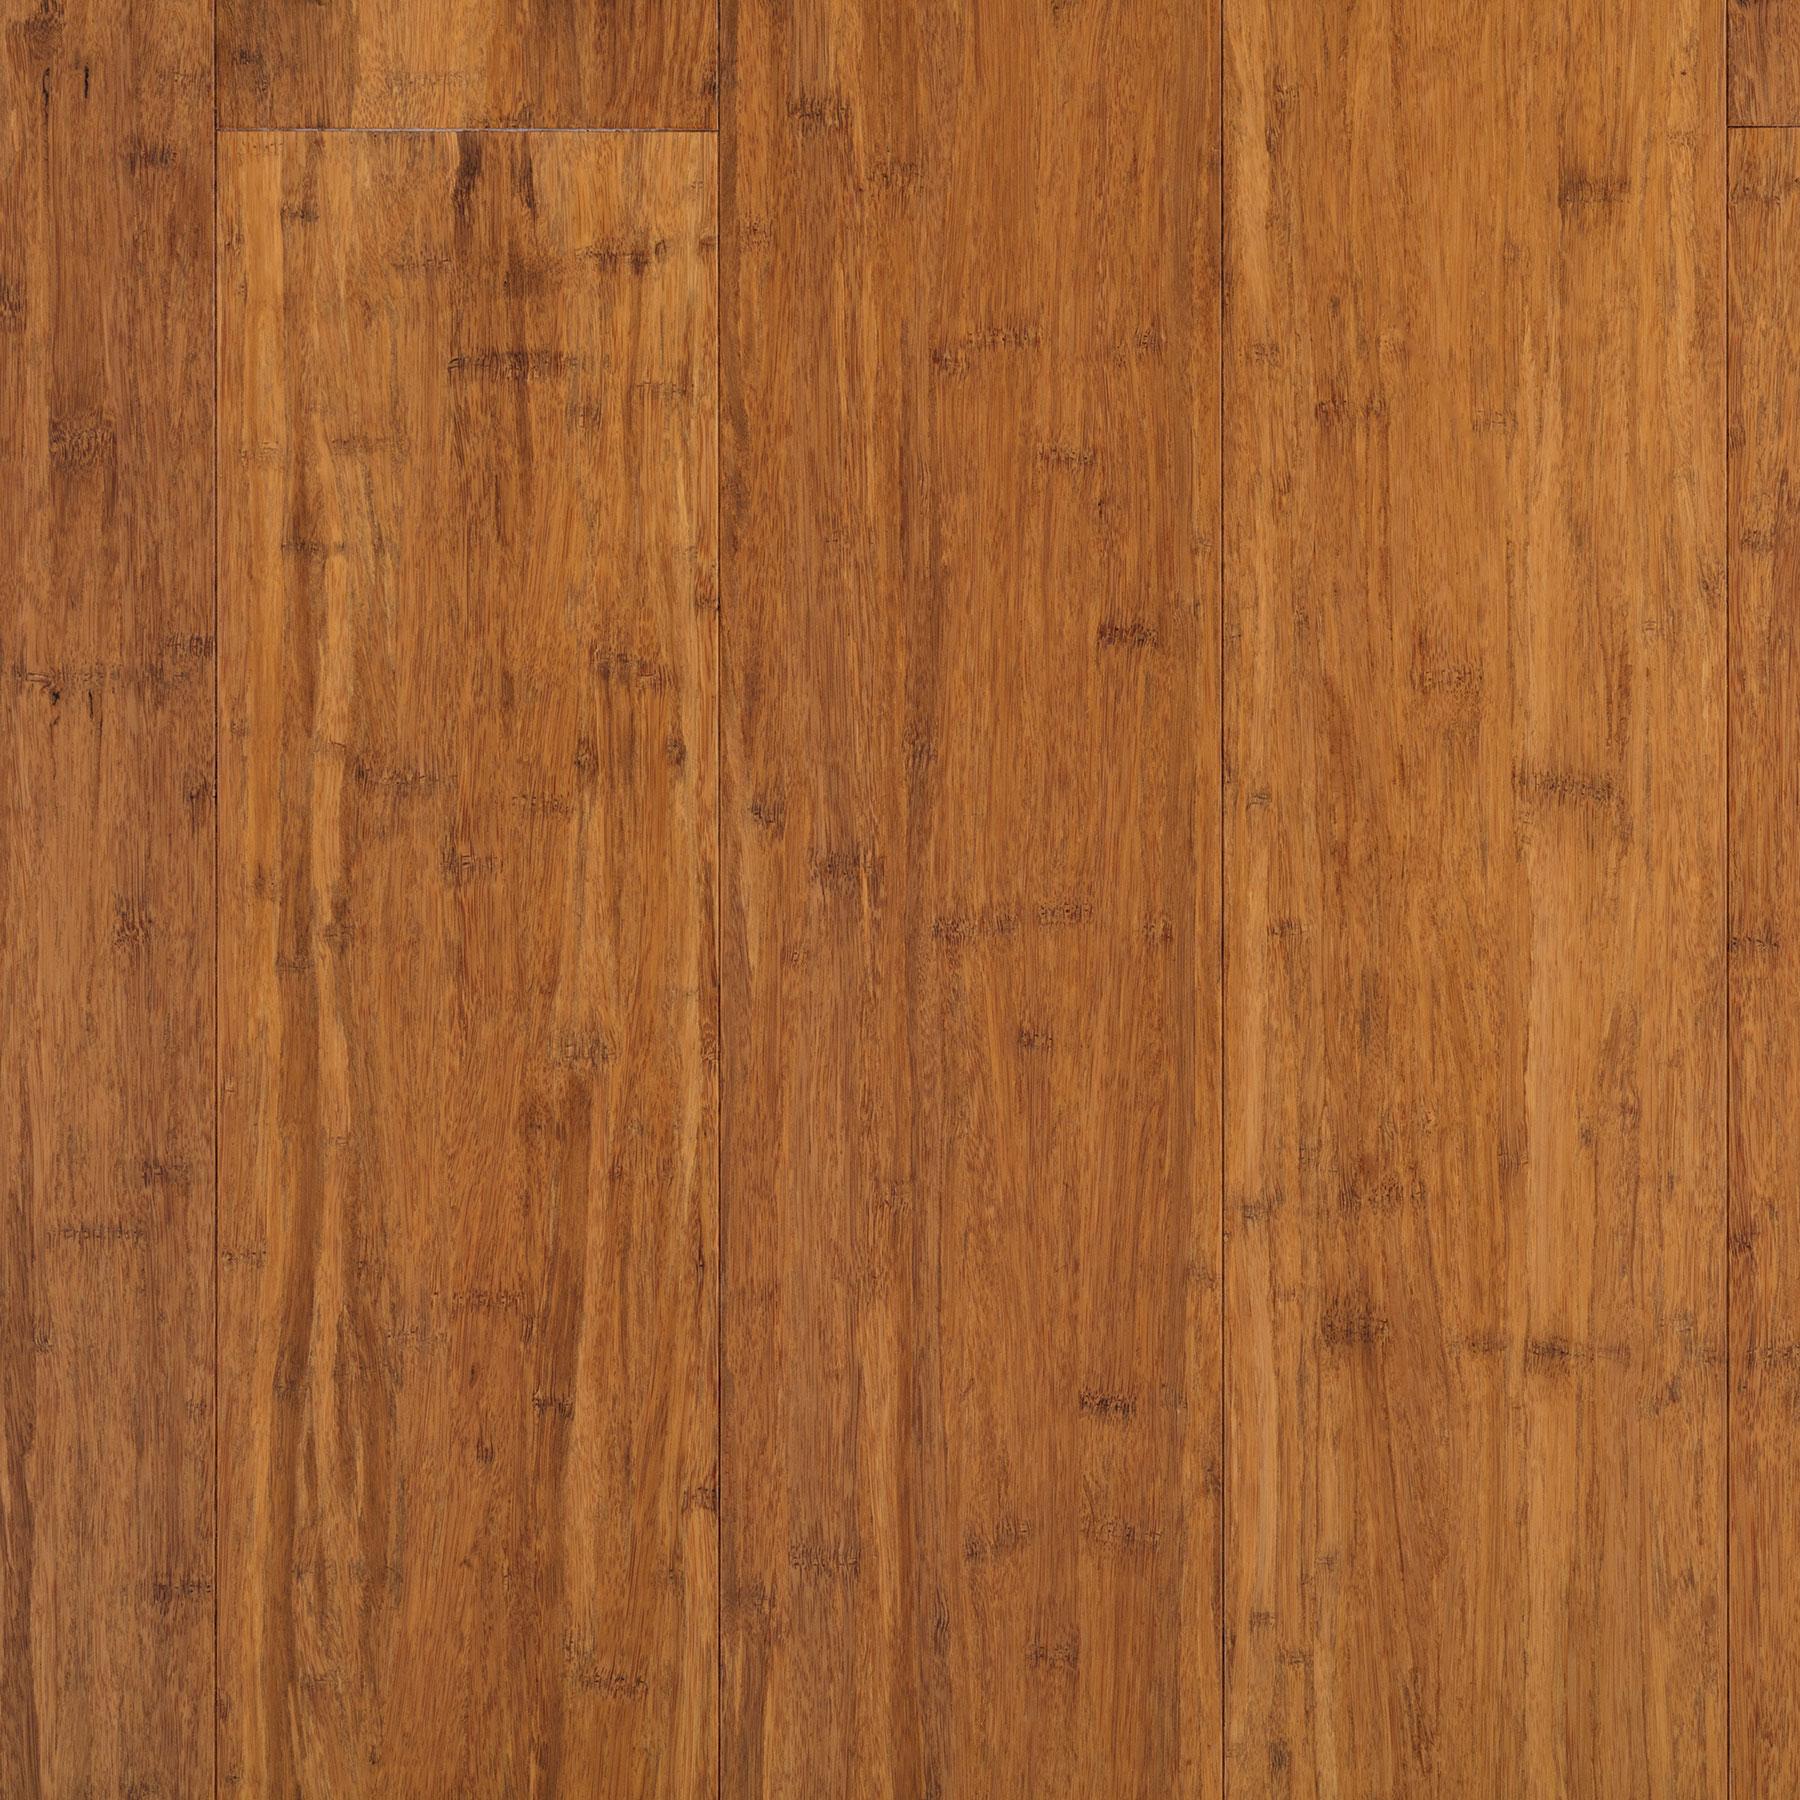 less flooring woven tigerwood ikea matttroy glue bamboo problems mirror timber feature strand length botanic floor